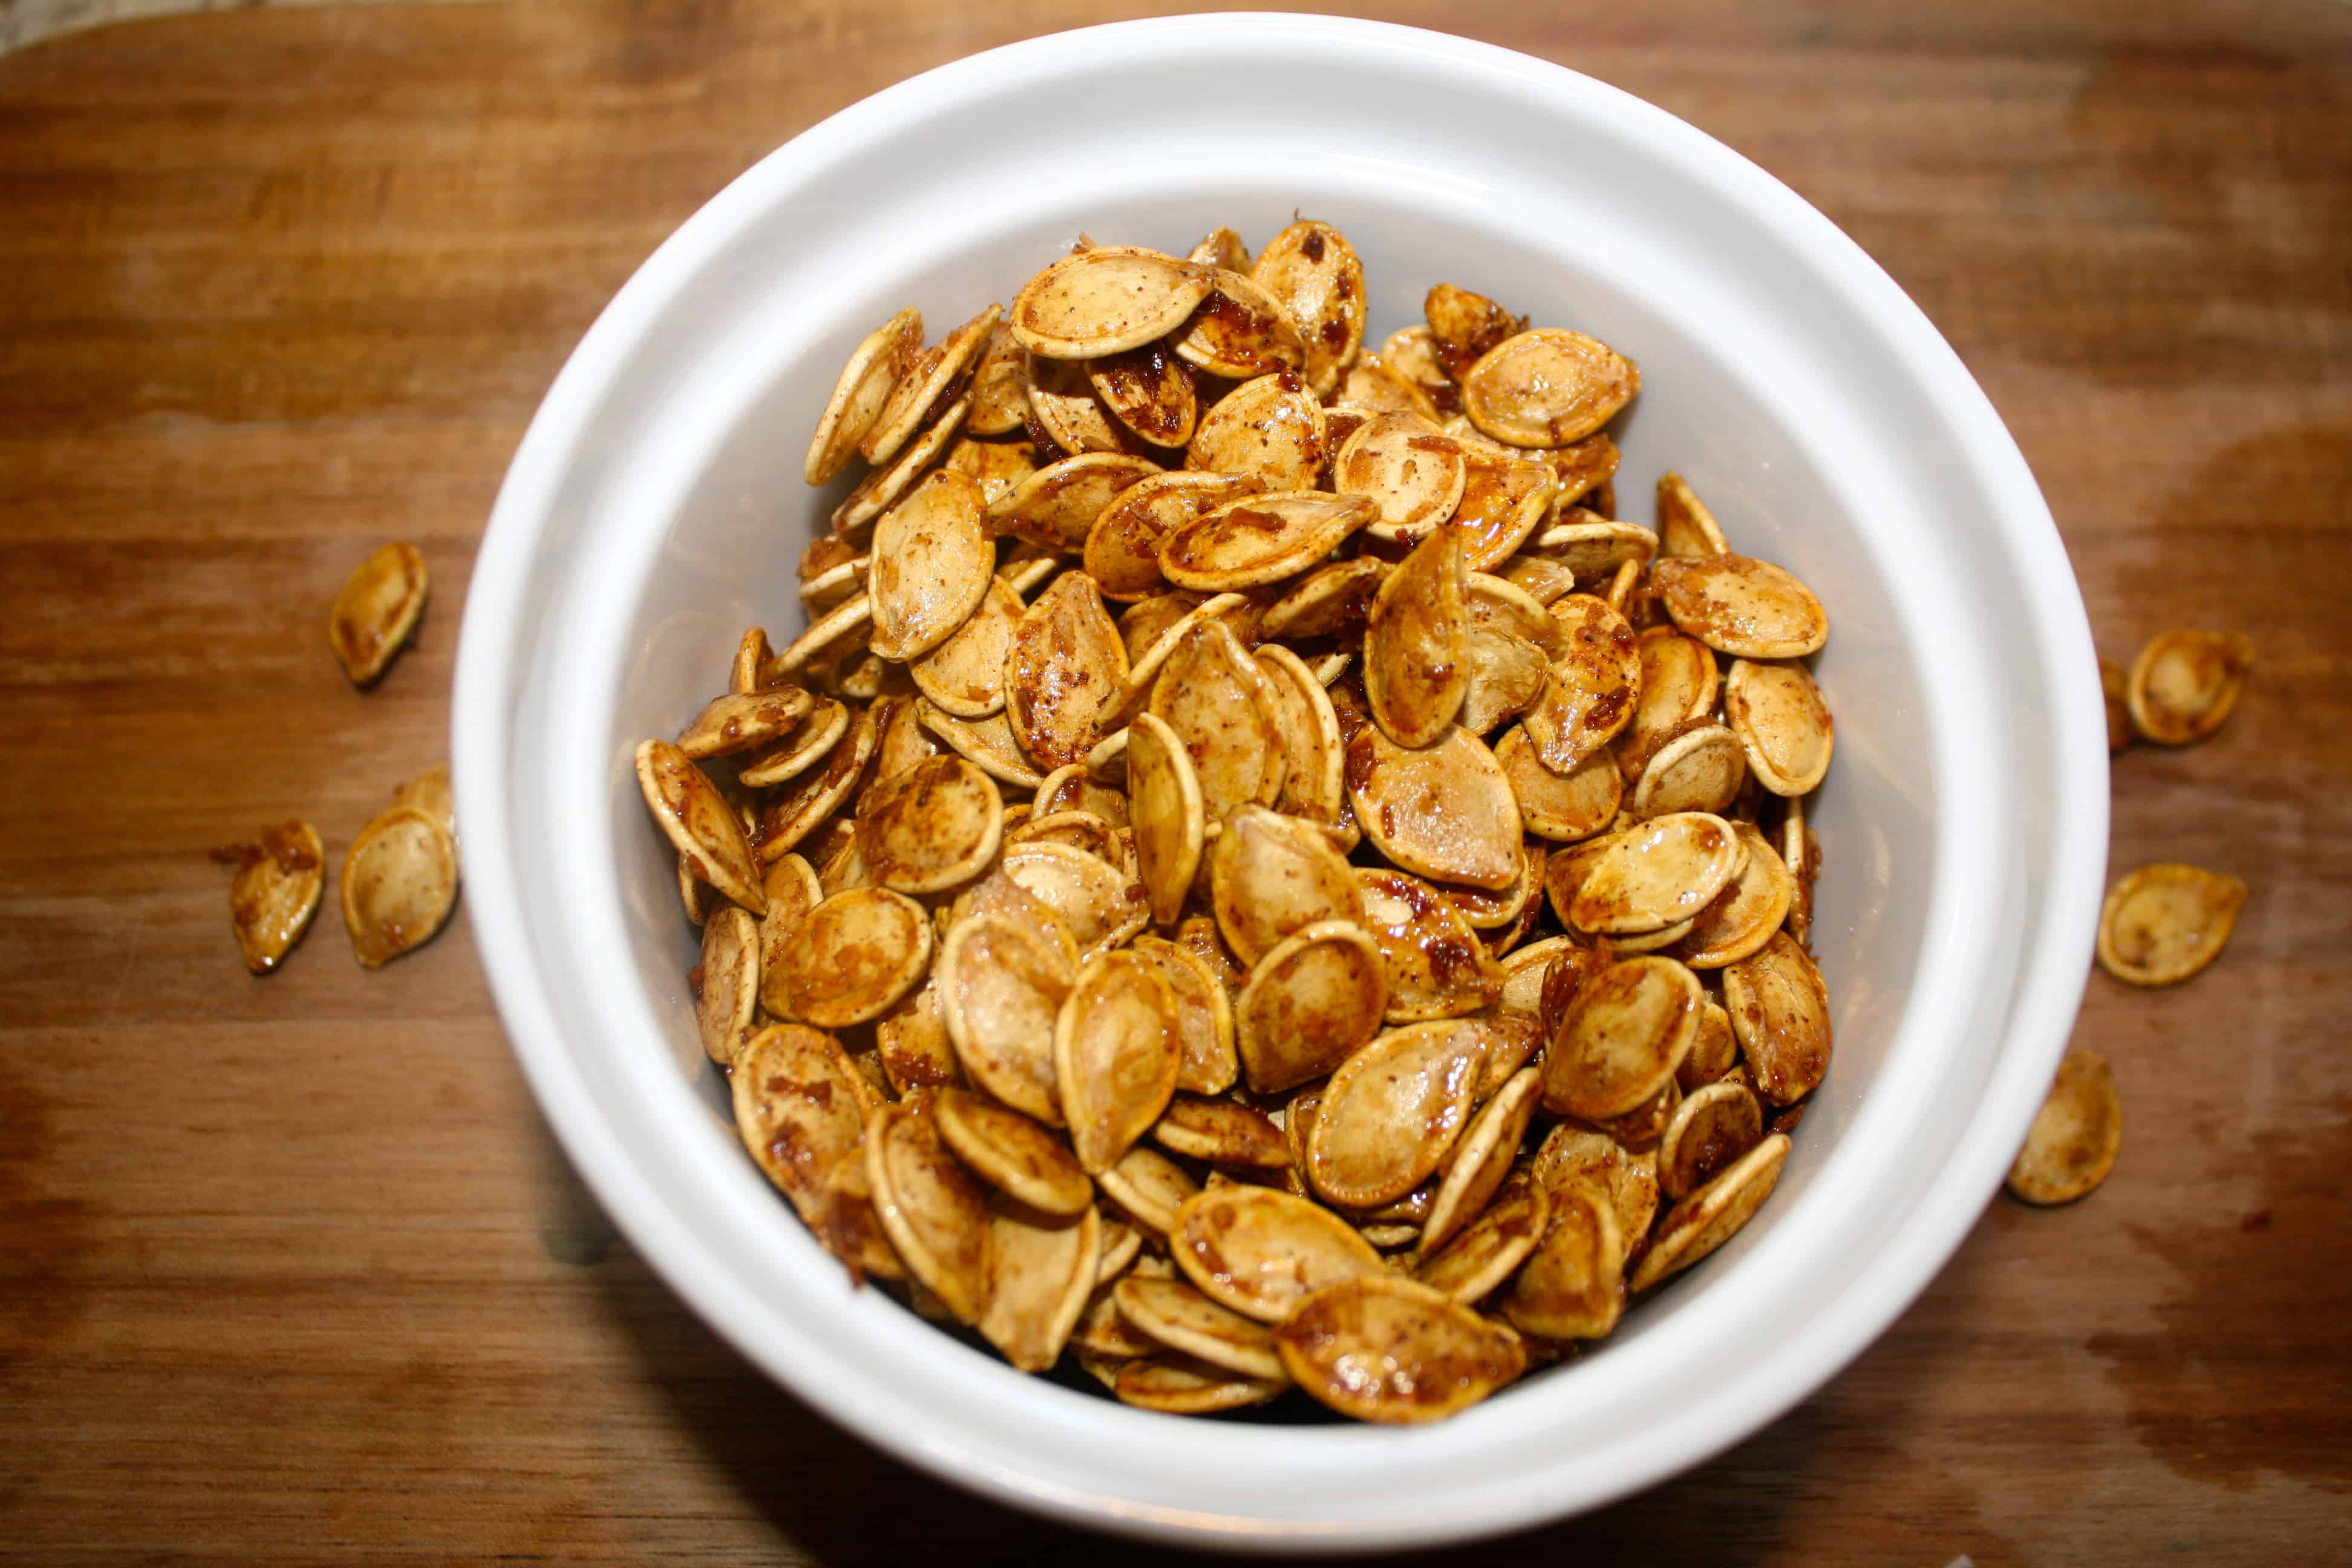 Healthy Roasted Pumpkin Seeds  How To Perfectly Roast Pumpkin Seeds • AwesomeJelly